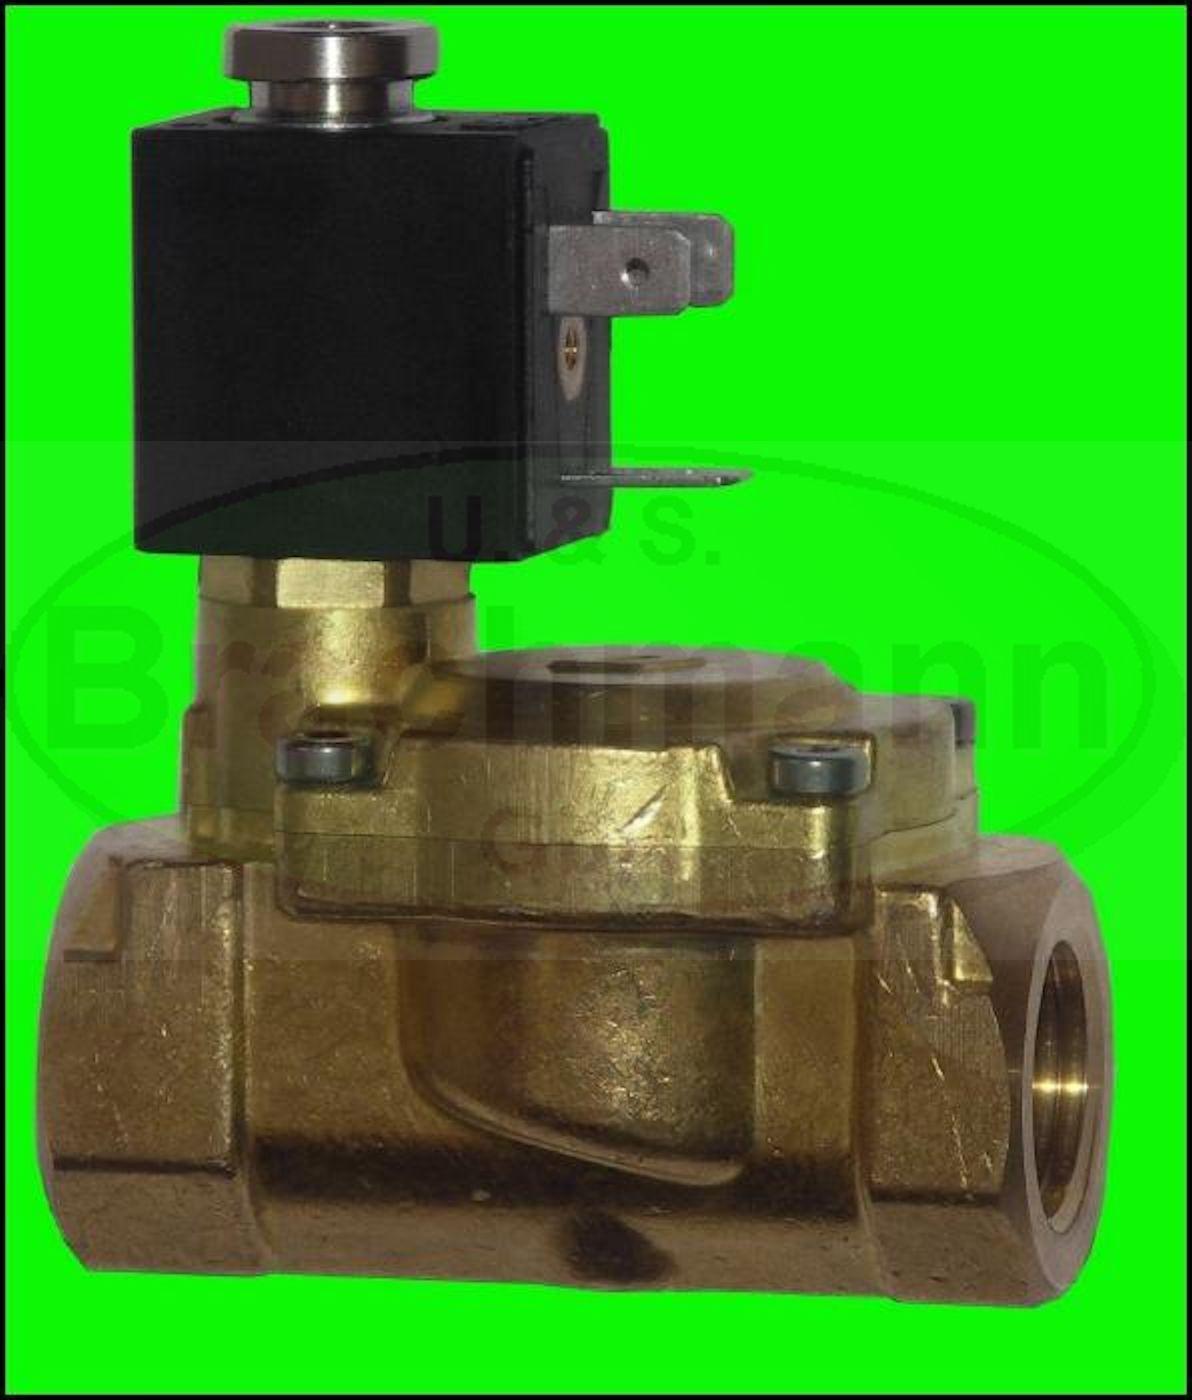 Magnetventil 1  Messing 230V 50Hz 12bar NO OLAB Trinkwasser DVGW